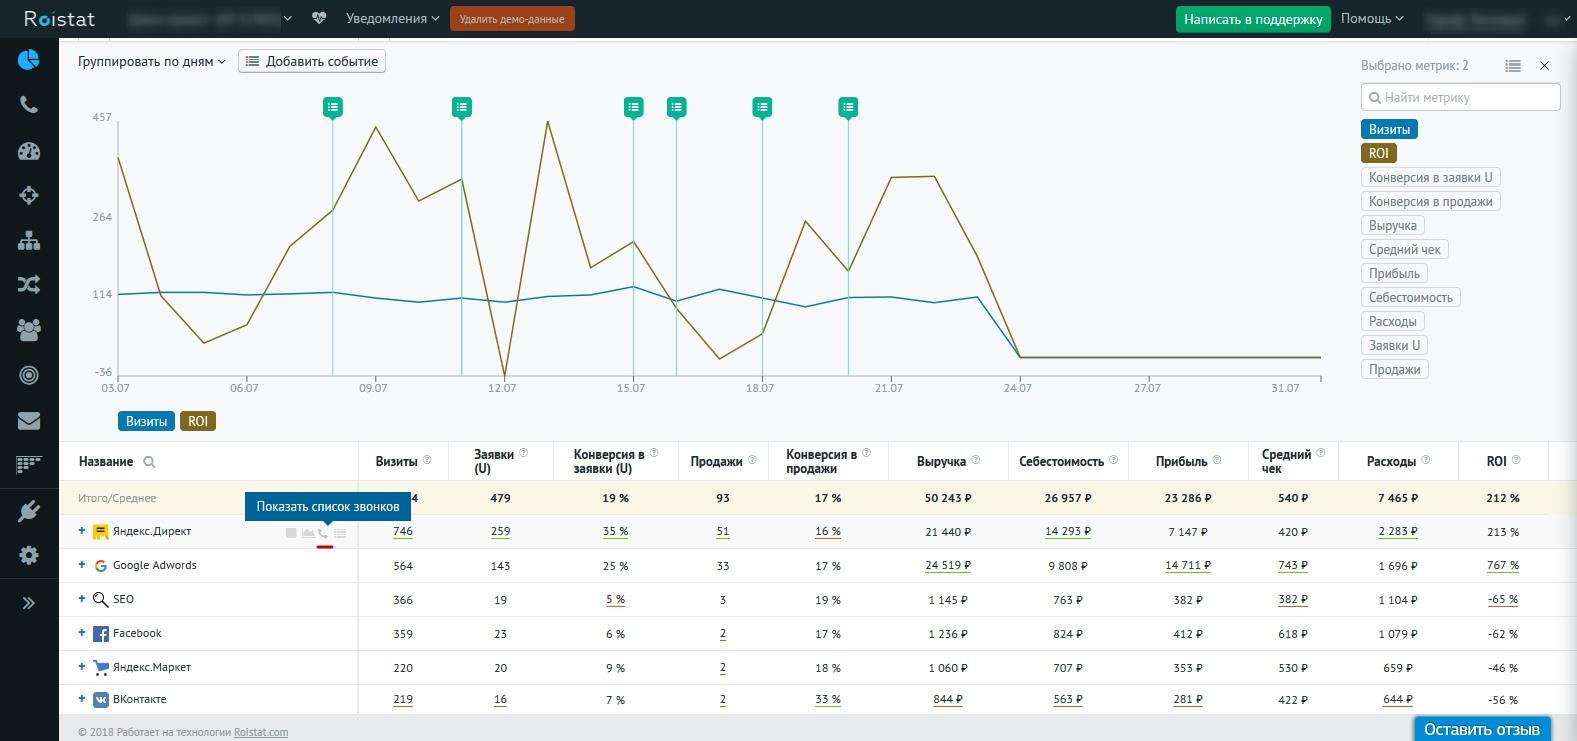 Roistat - Аналитика - Кнопка показать список звонков